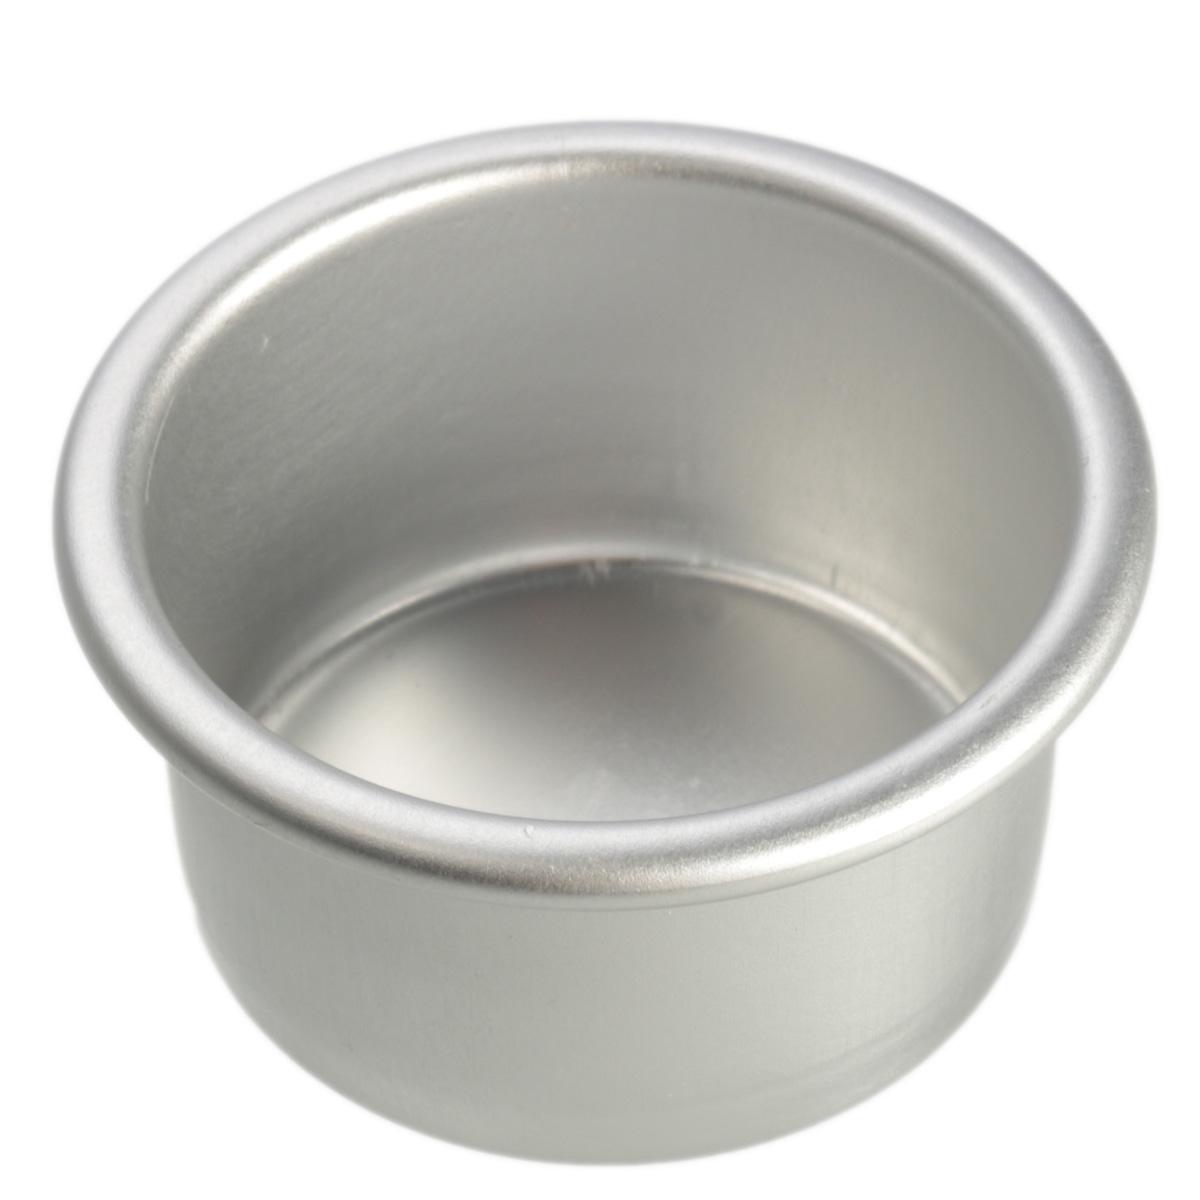 New 2/4/6/8'' Aluminum Alloy Non-stick Round Cake Baking Mould Pan Bakeware Tool